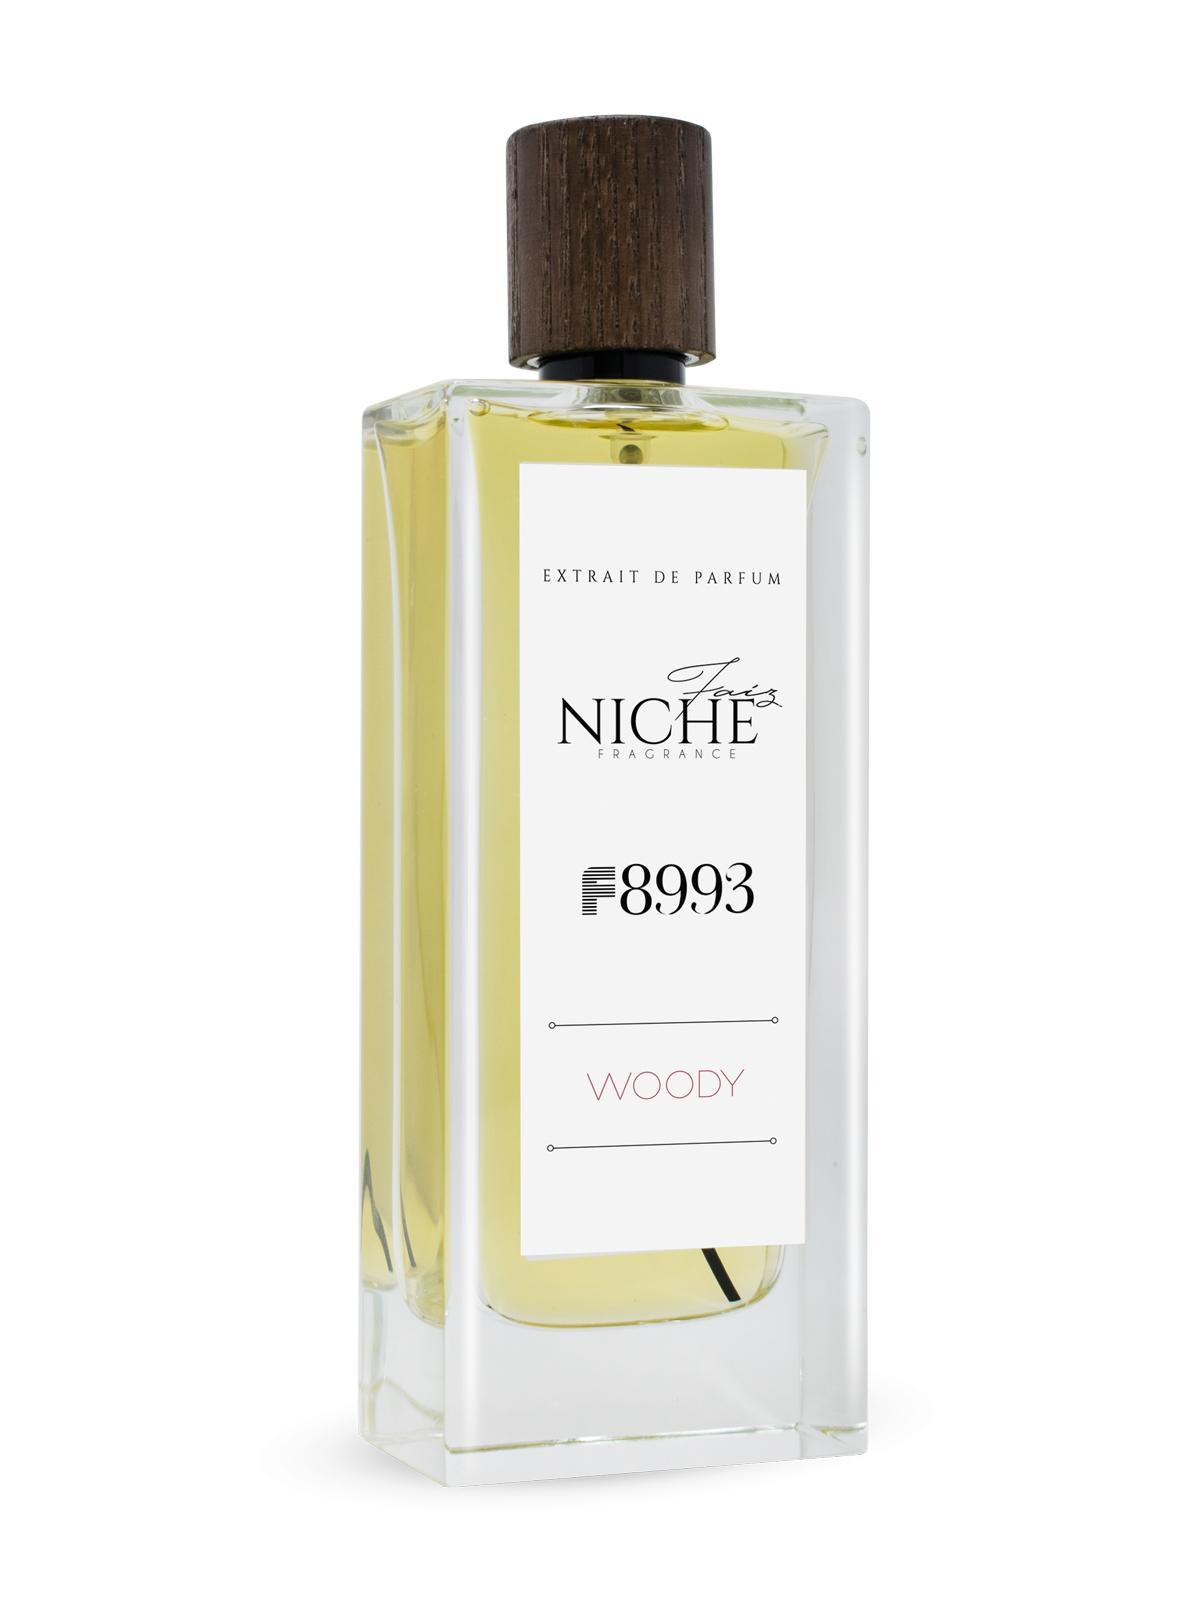 Faiz Niche Collection Woody F8993 Extrait De Parfum 80ML